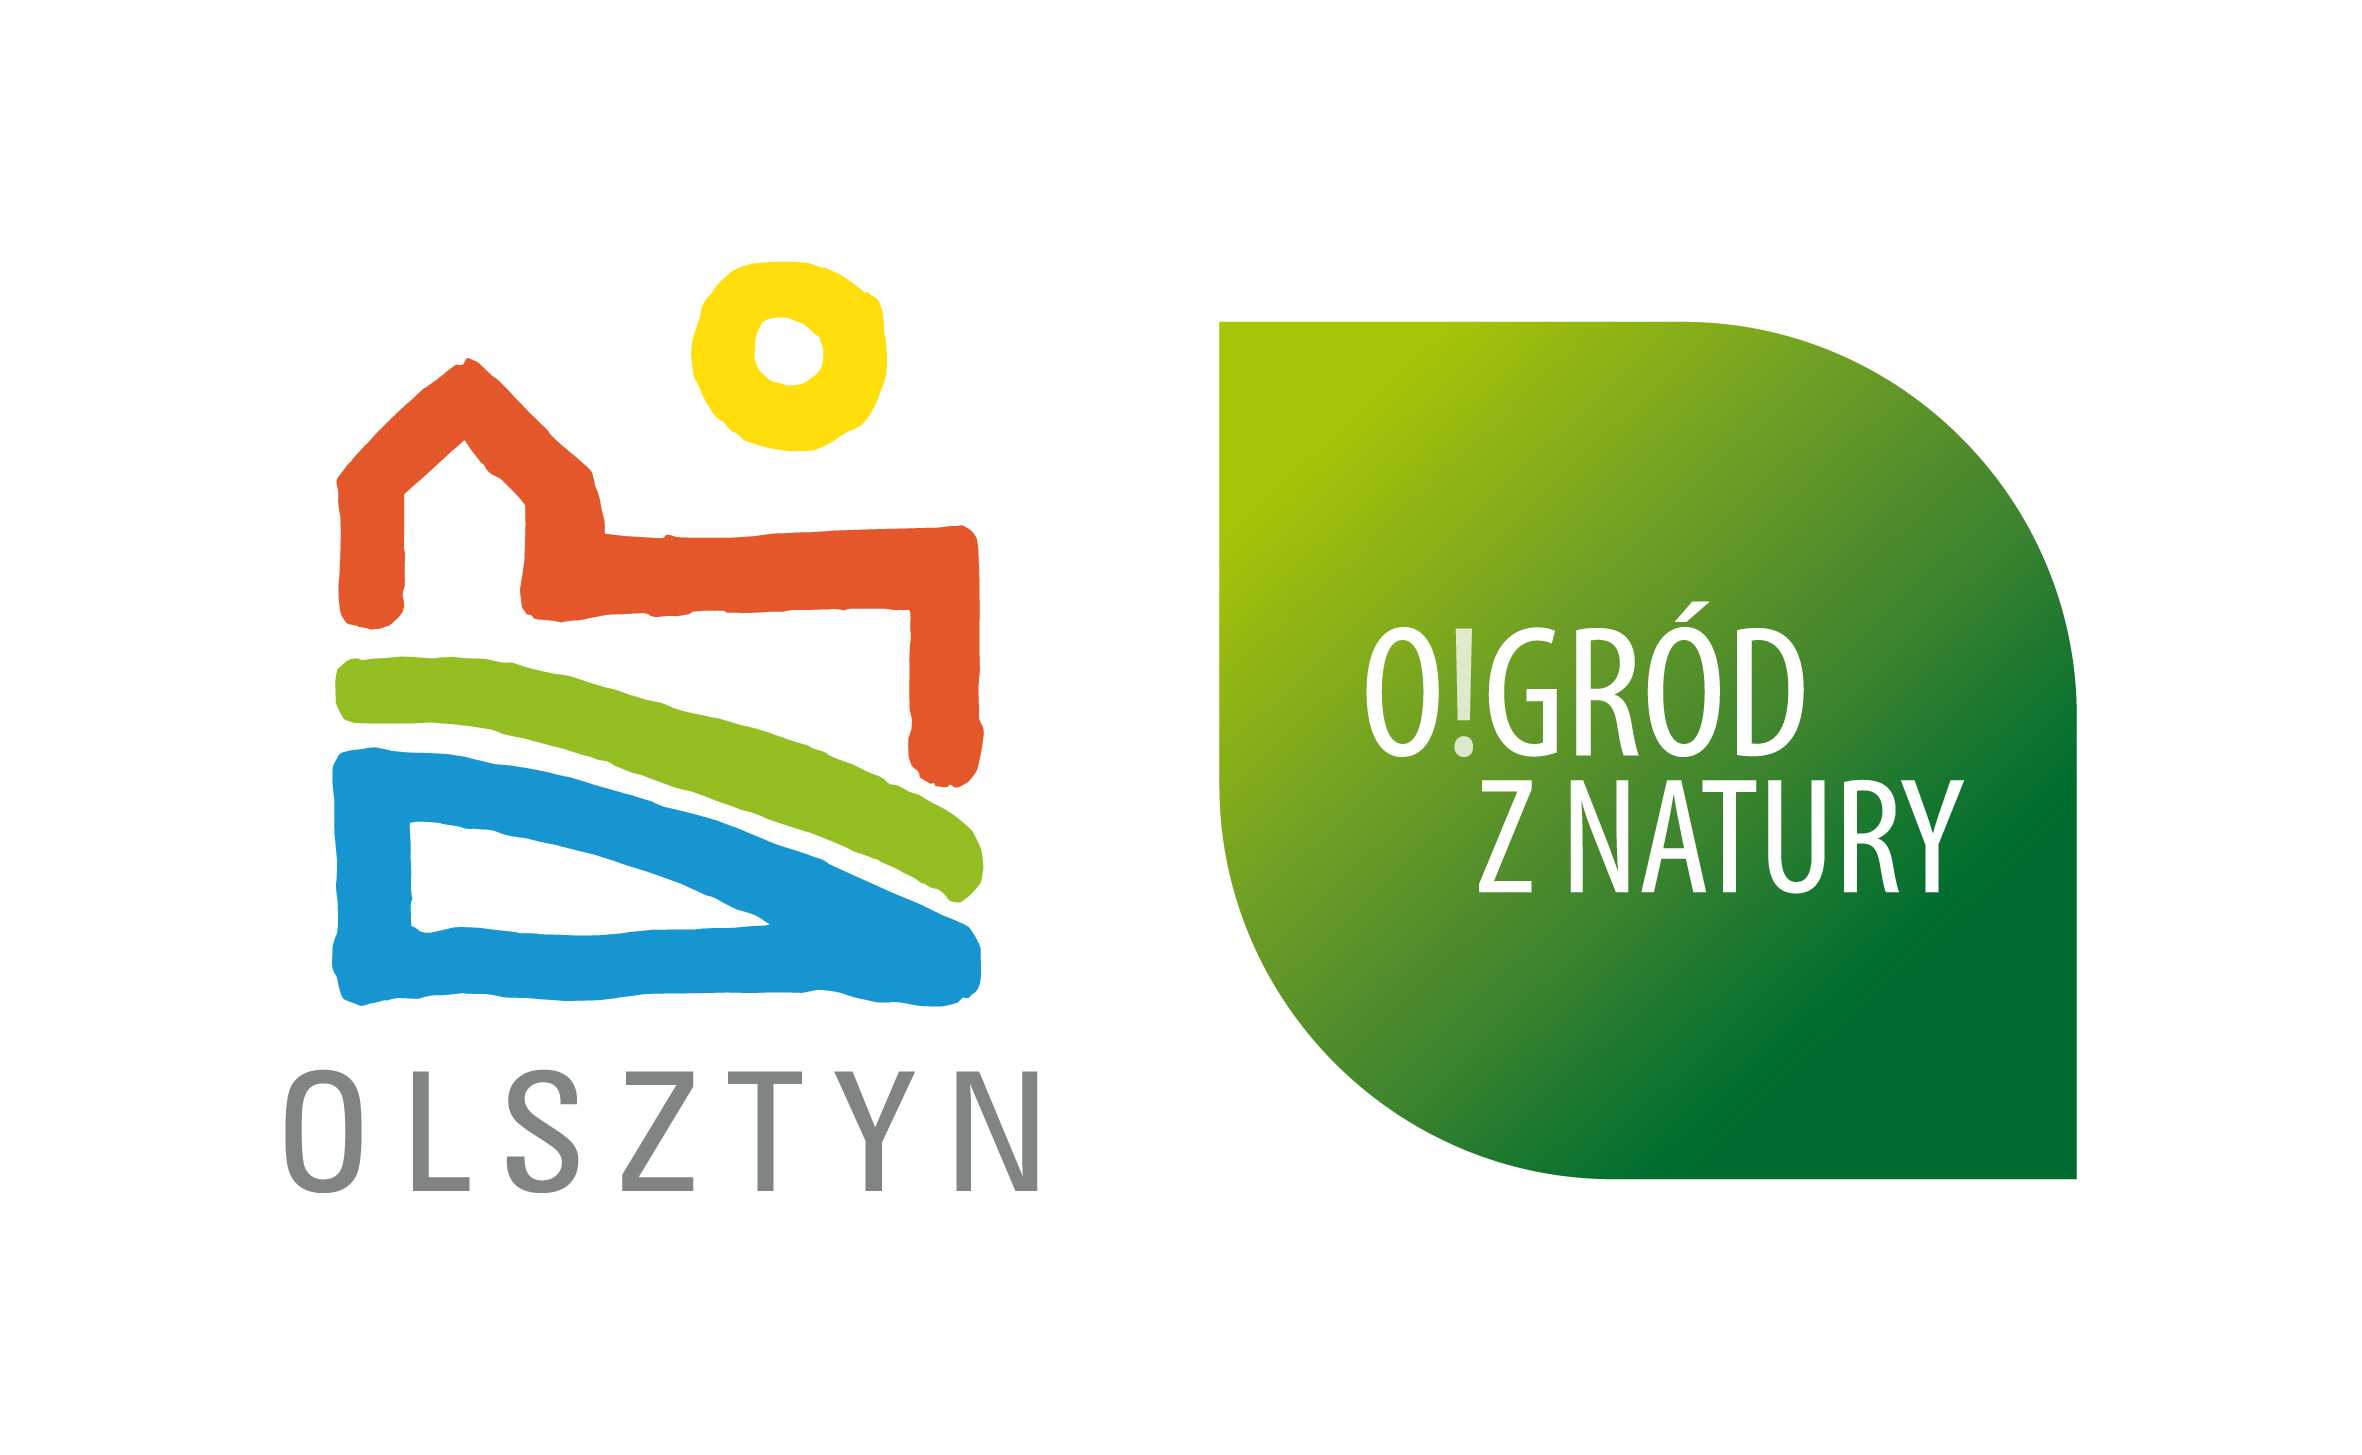 https://m.wmwm.pl/2017/10/orig/logo-z-listkiem-5884.jpg